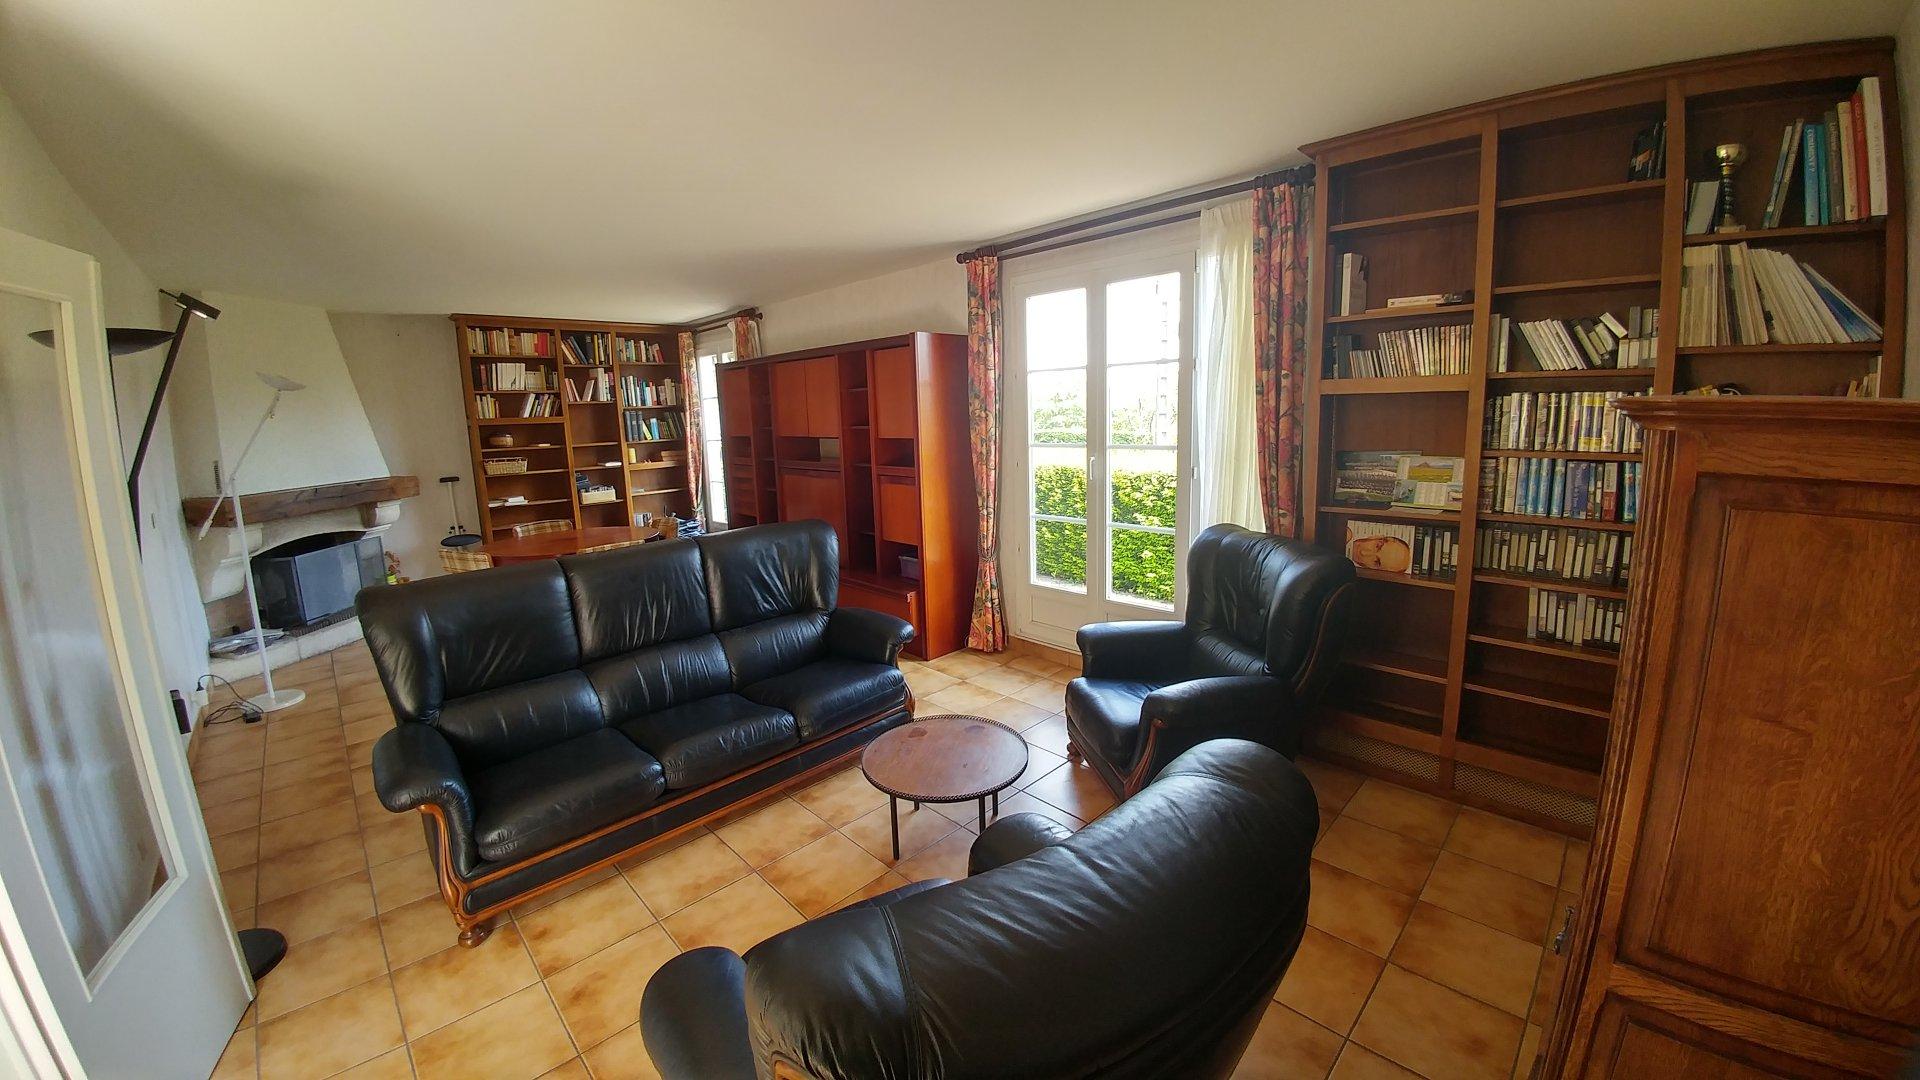 MAISON 135 m² AU CALME - VENDUE